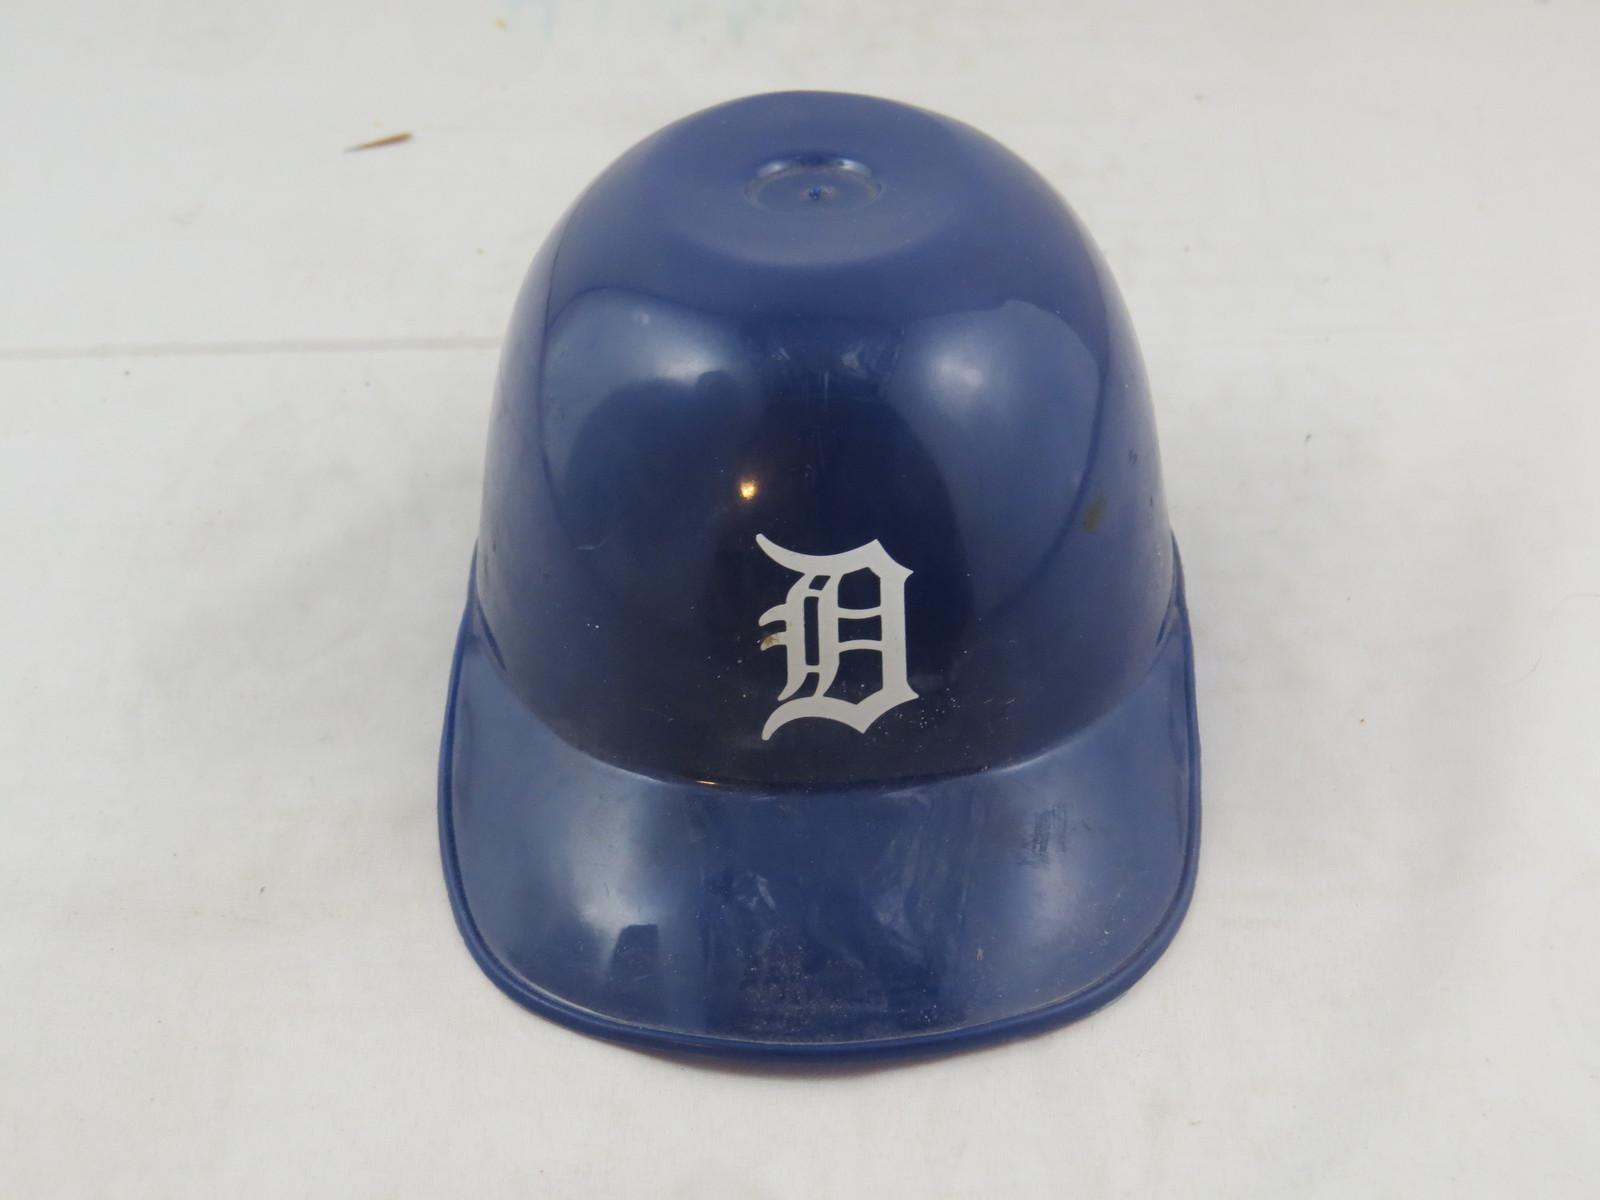 Detroit Tigers Mini Helmet - Dairy Queen Promo 1980 - Laich Industries - $19.00